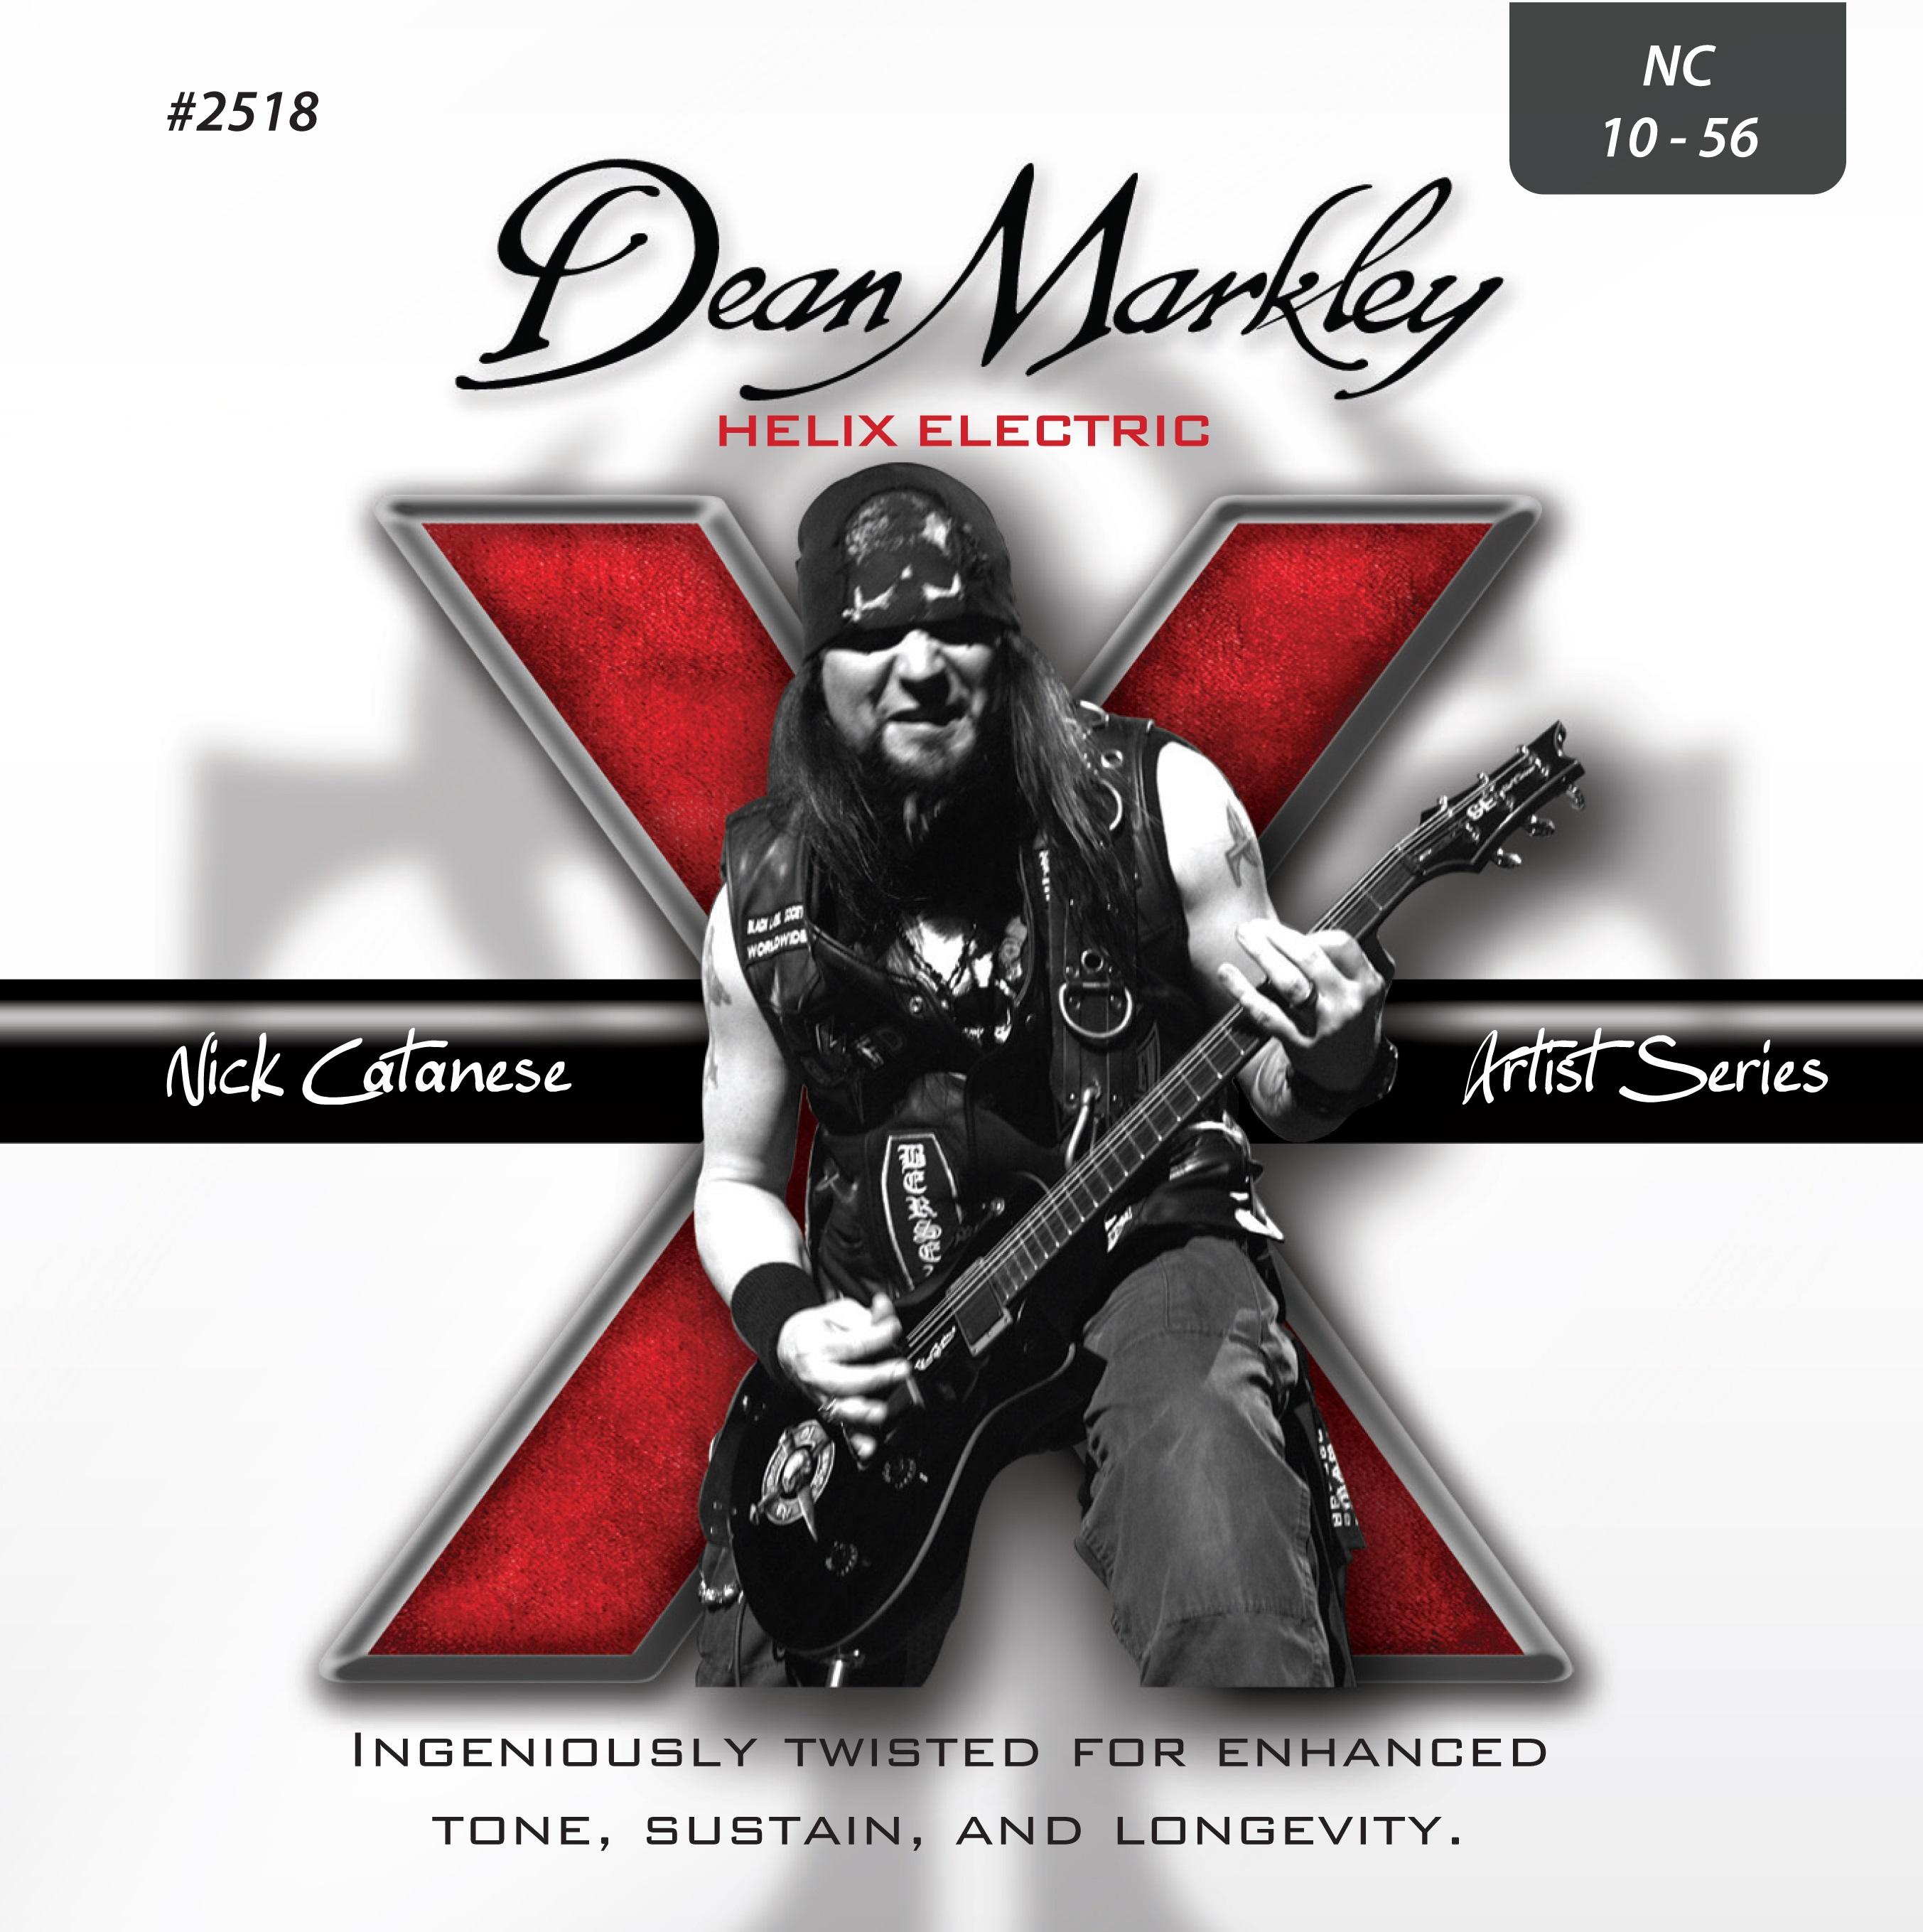 Dean Markley 2518 10-56 Helix HD Nick Catanese